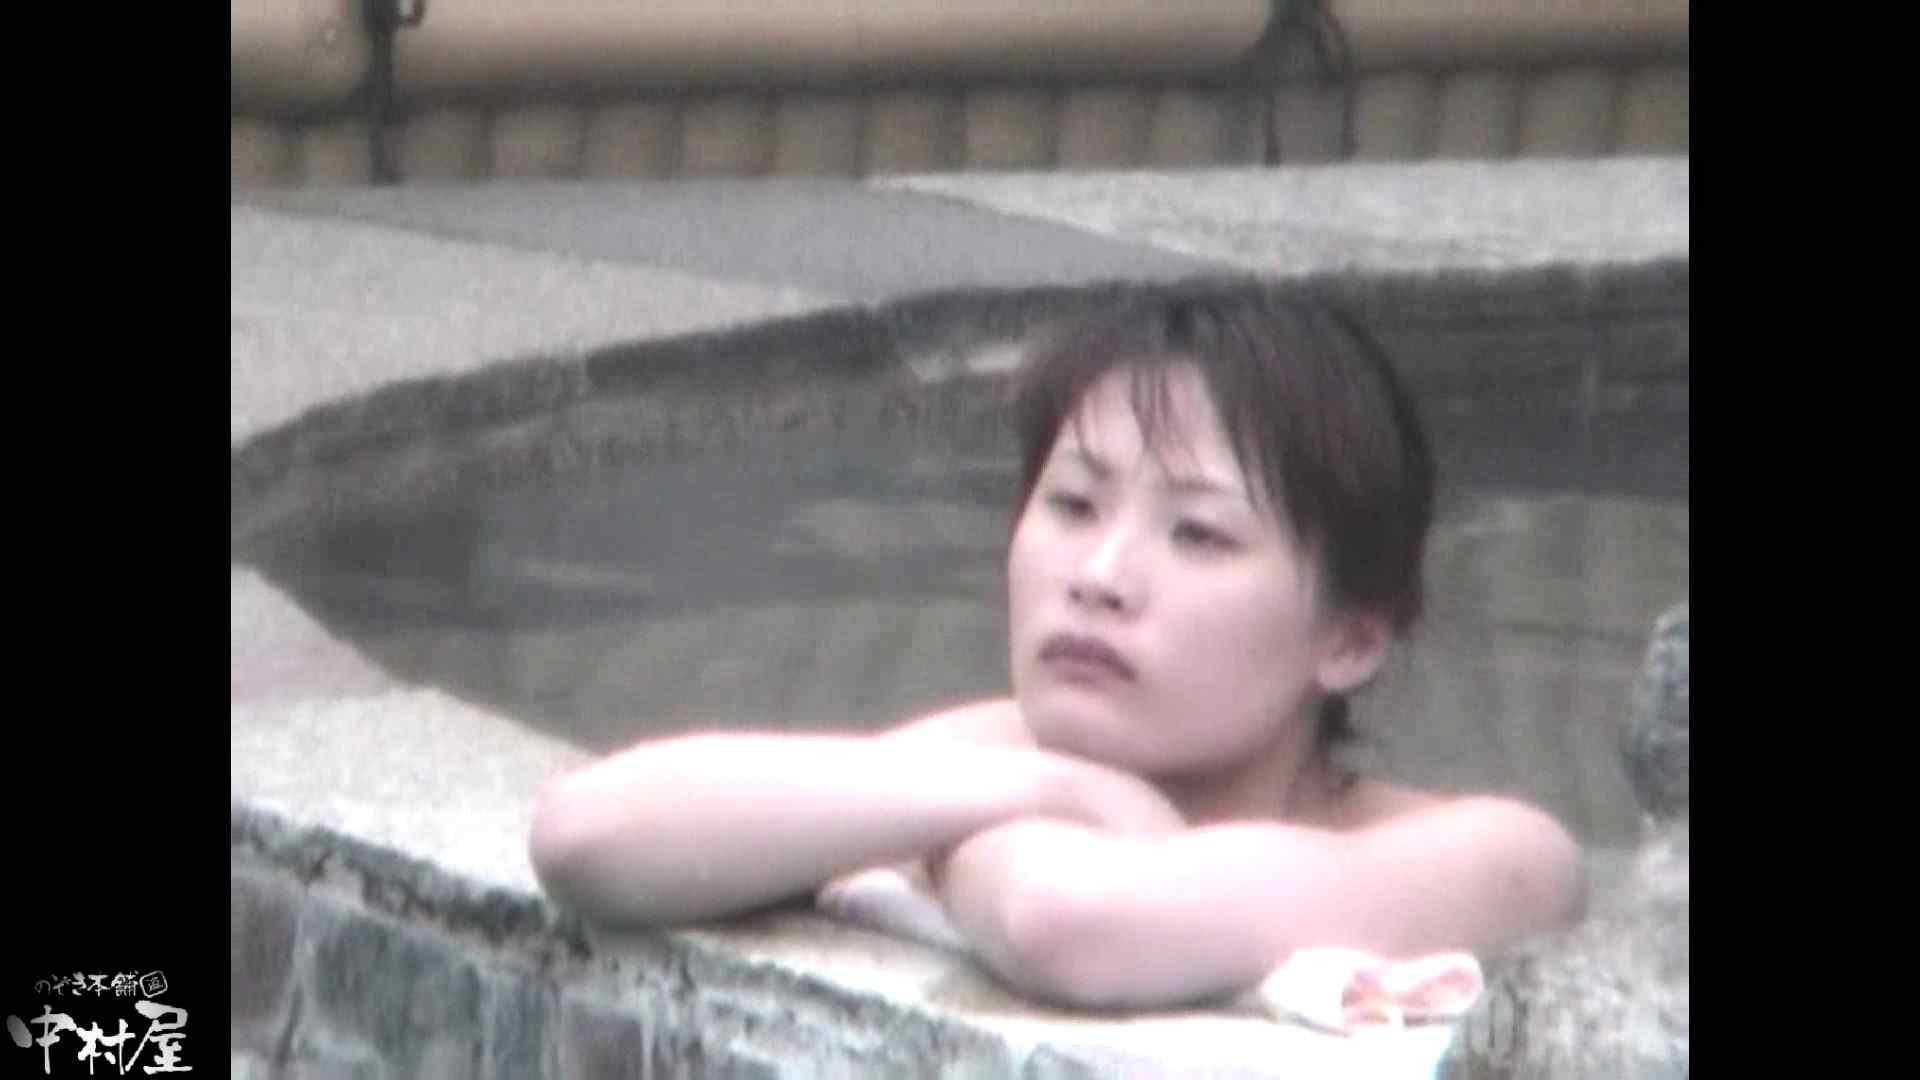 Aquaな露天風呂Vol.878潜入盗撮露天風呂十四判湯 其の三 潜入  48連発 29